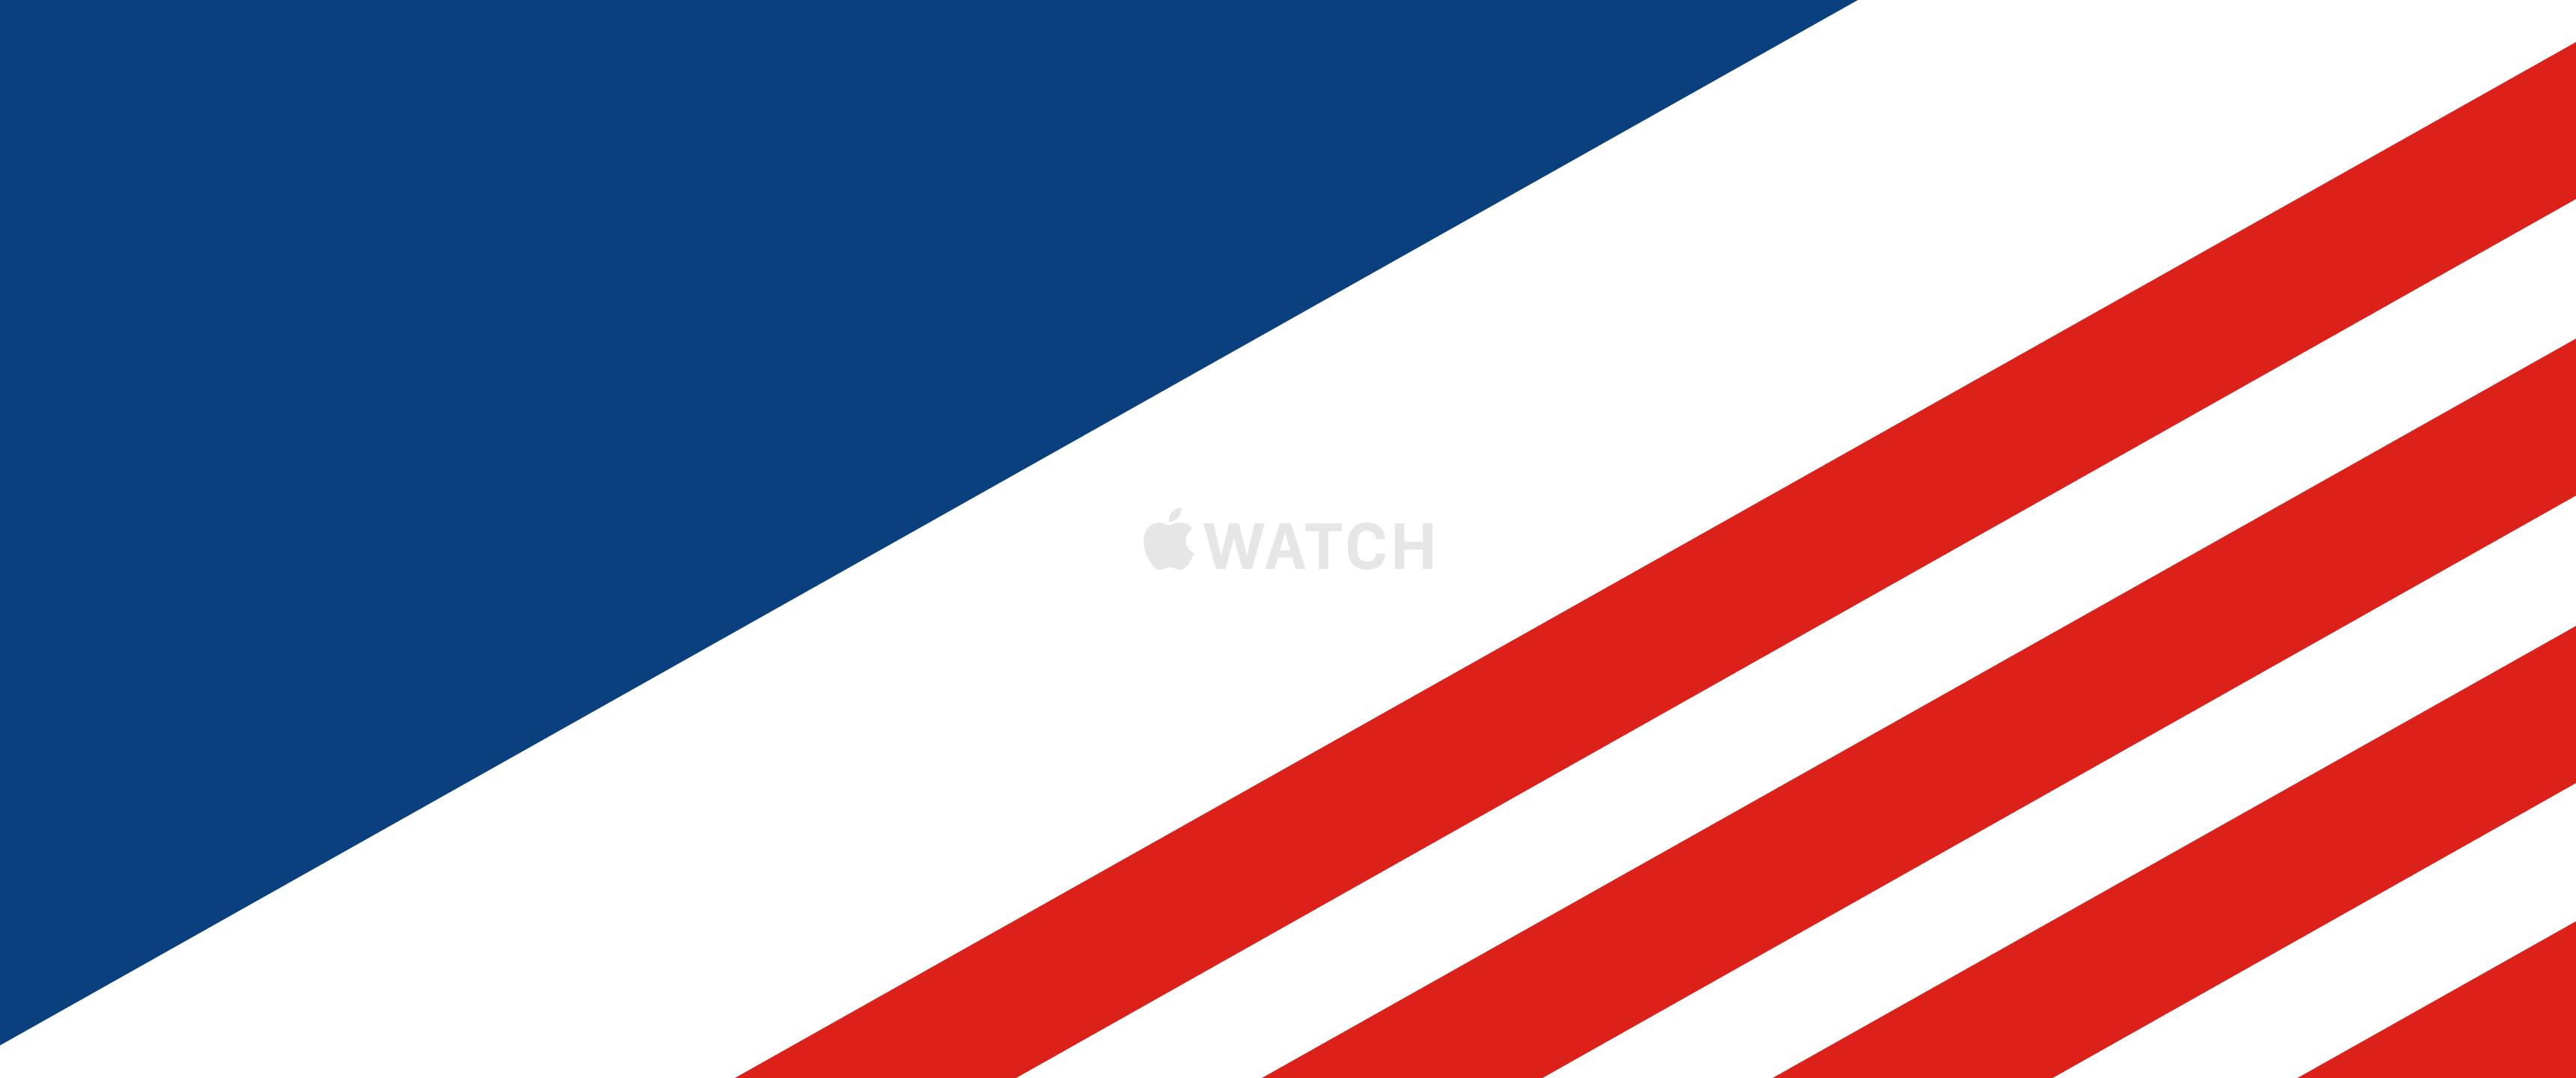 Flag USA Apple Inc Watch Computer 3440x1440